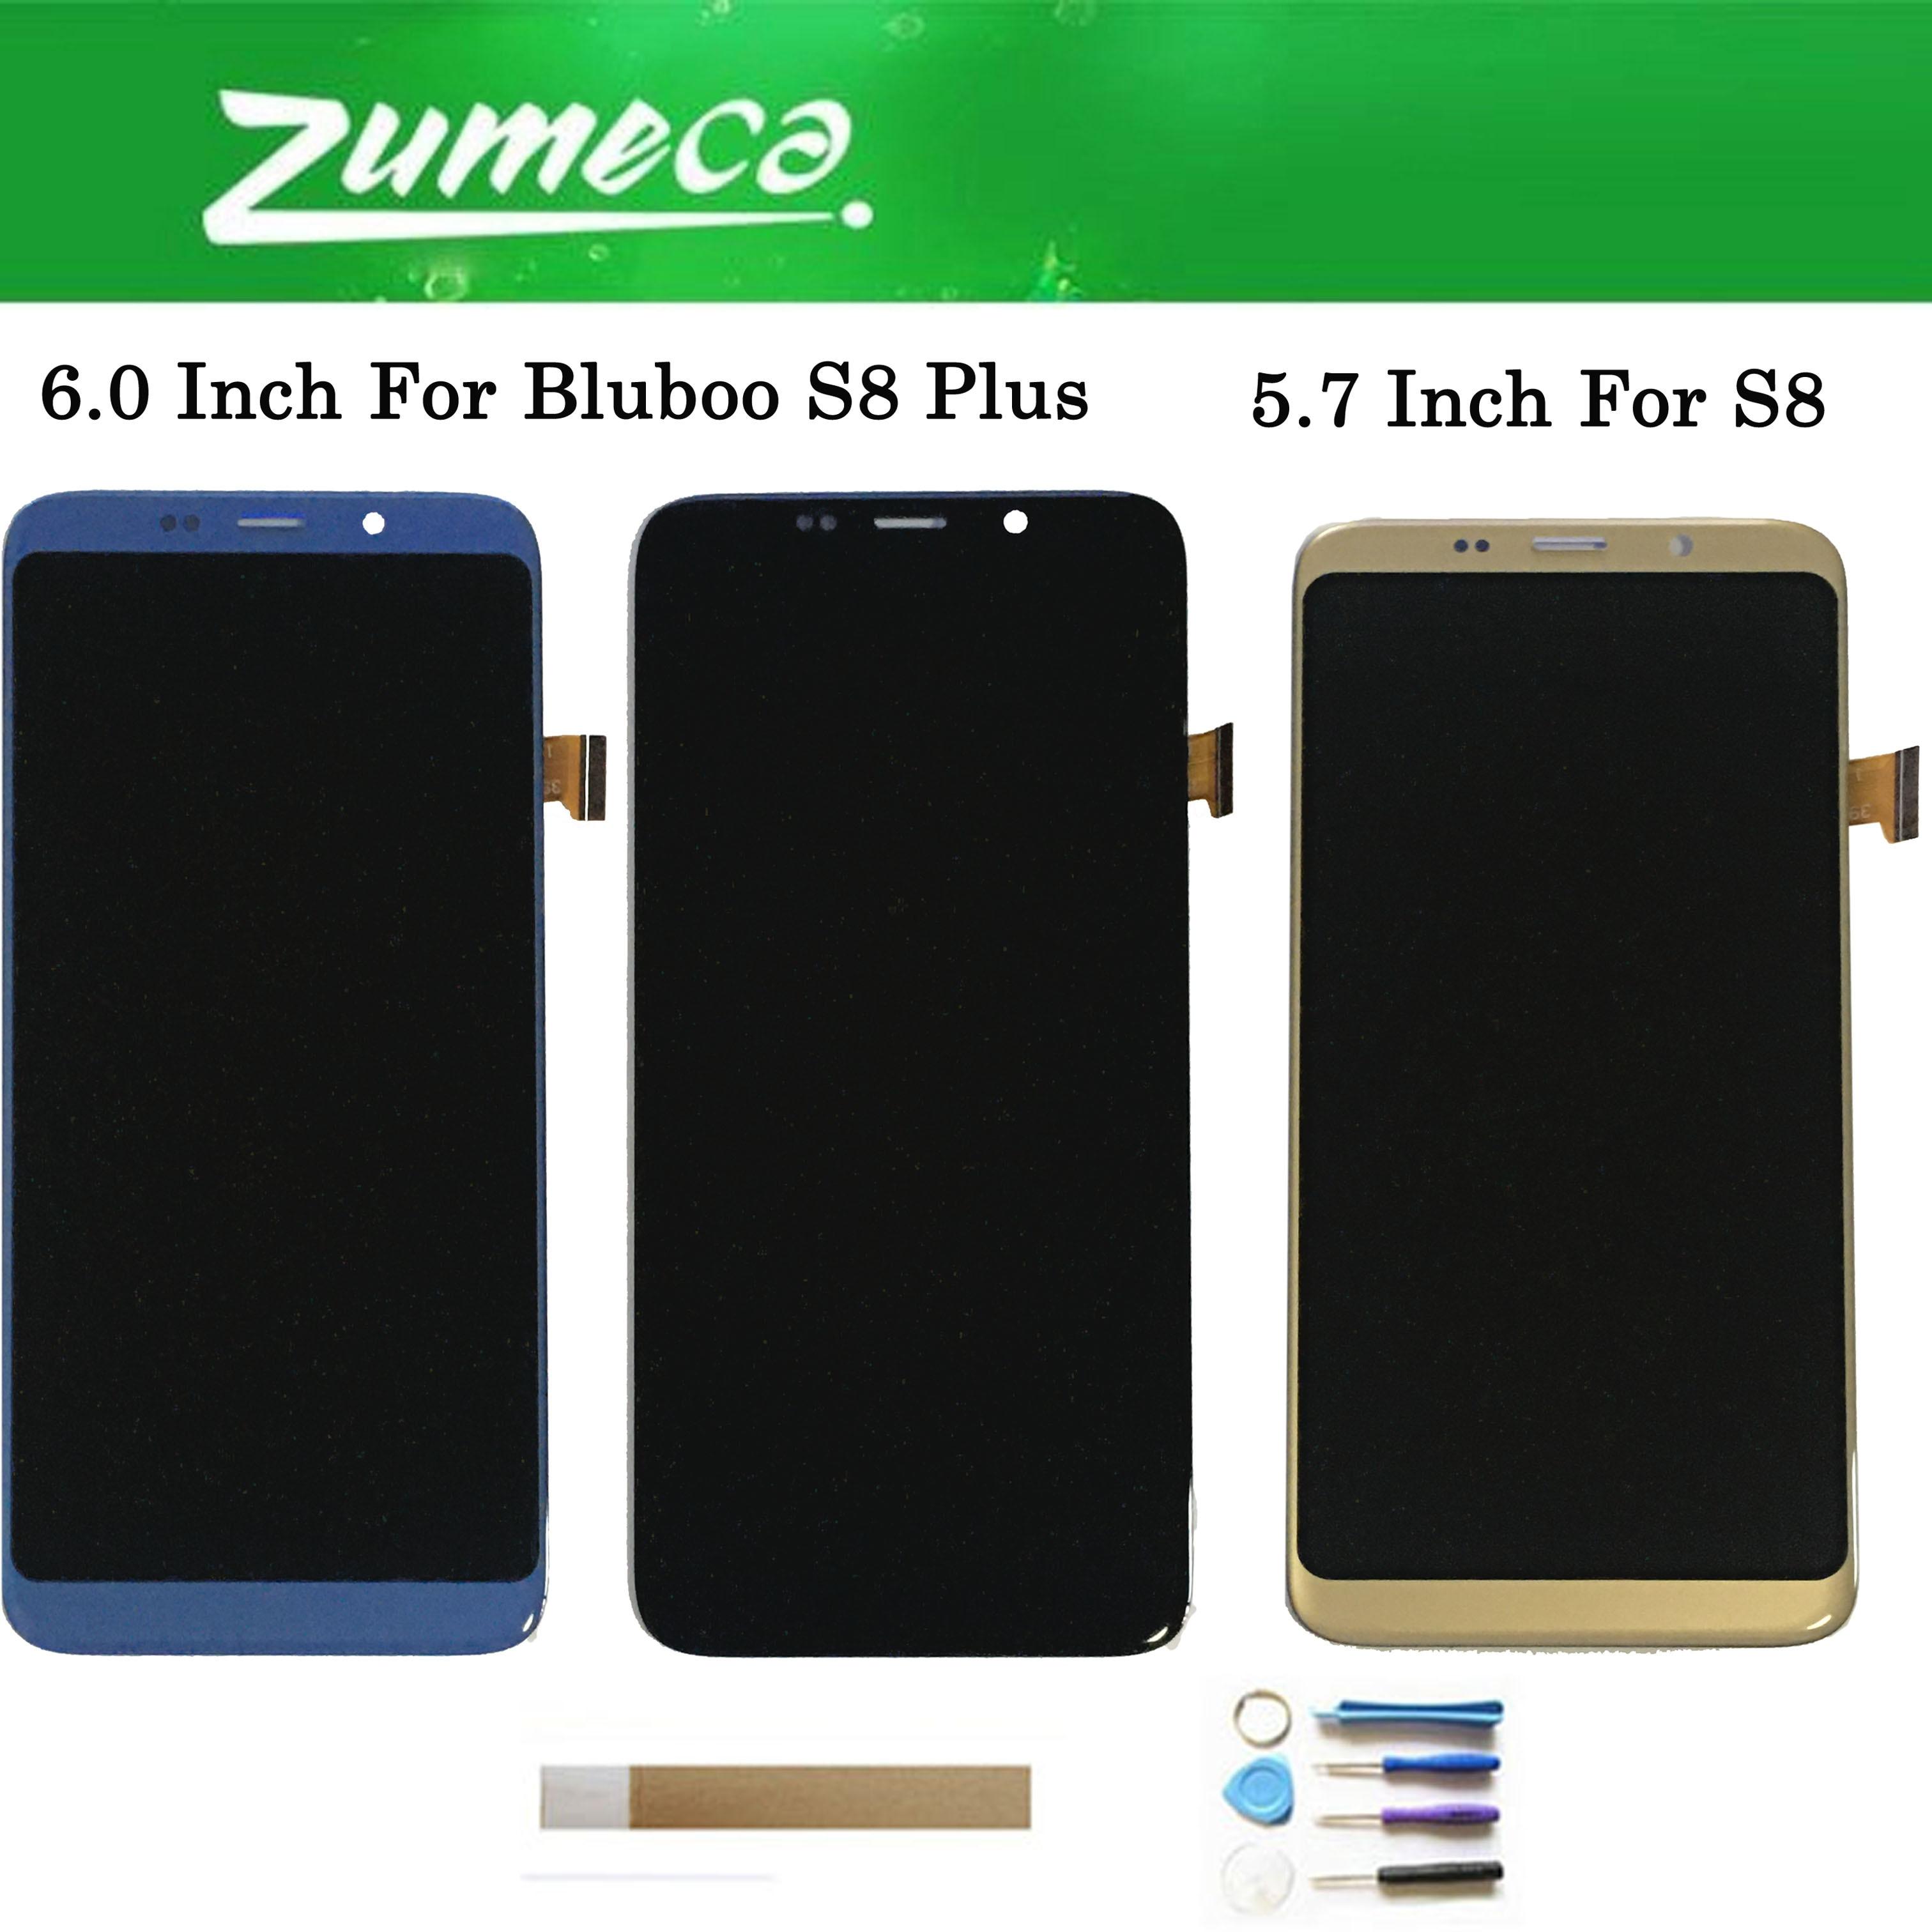 Original para Bluboo S8 / Bluboo S8 Plus pantalla LCD + Digitalizador de pantalla táctil negro dorado azul para Bluboo S8 +